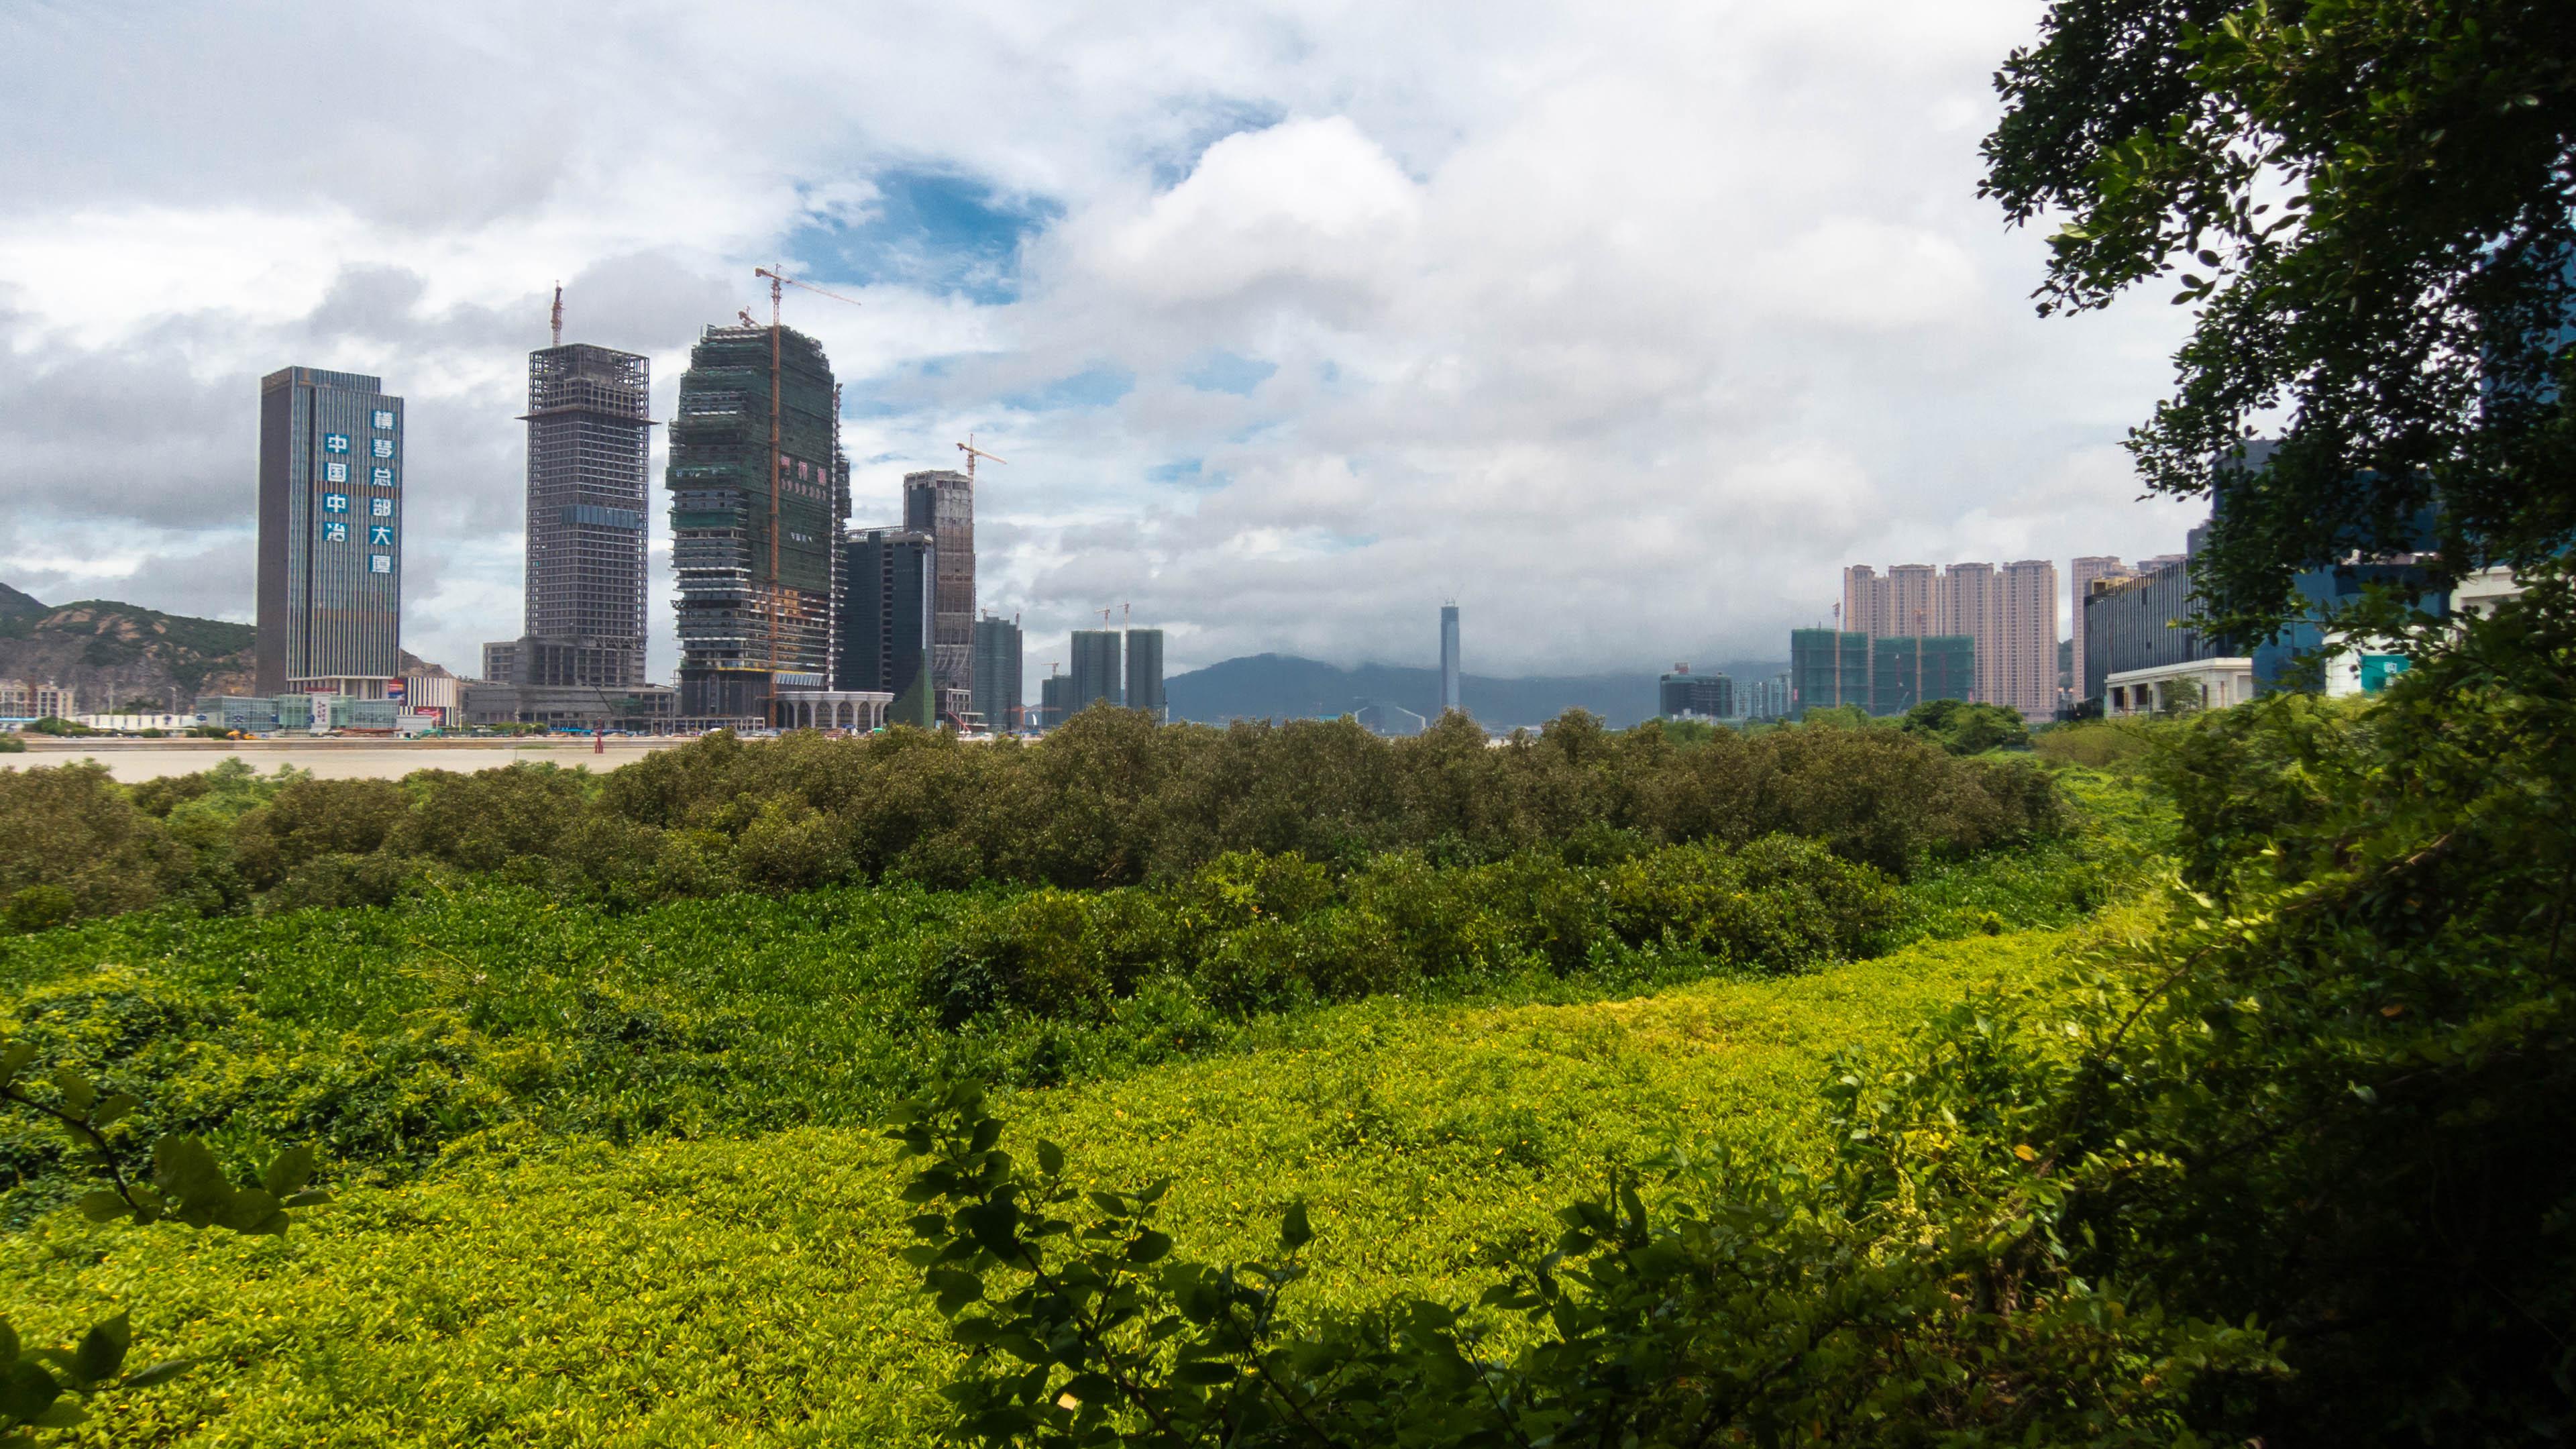 Links VR China, rechts Macau